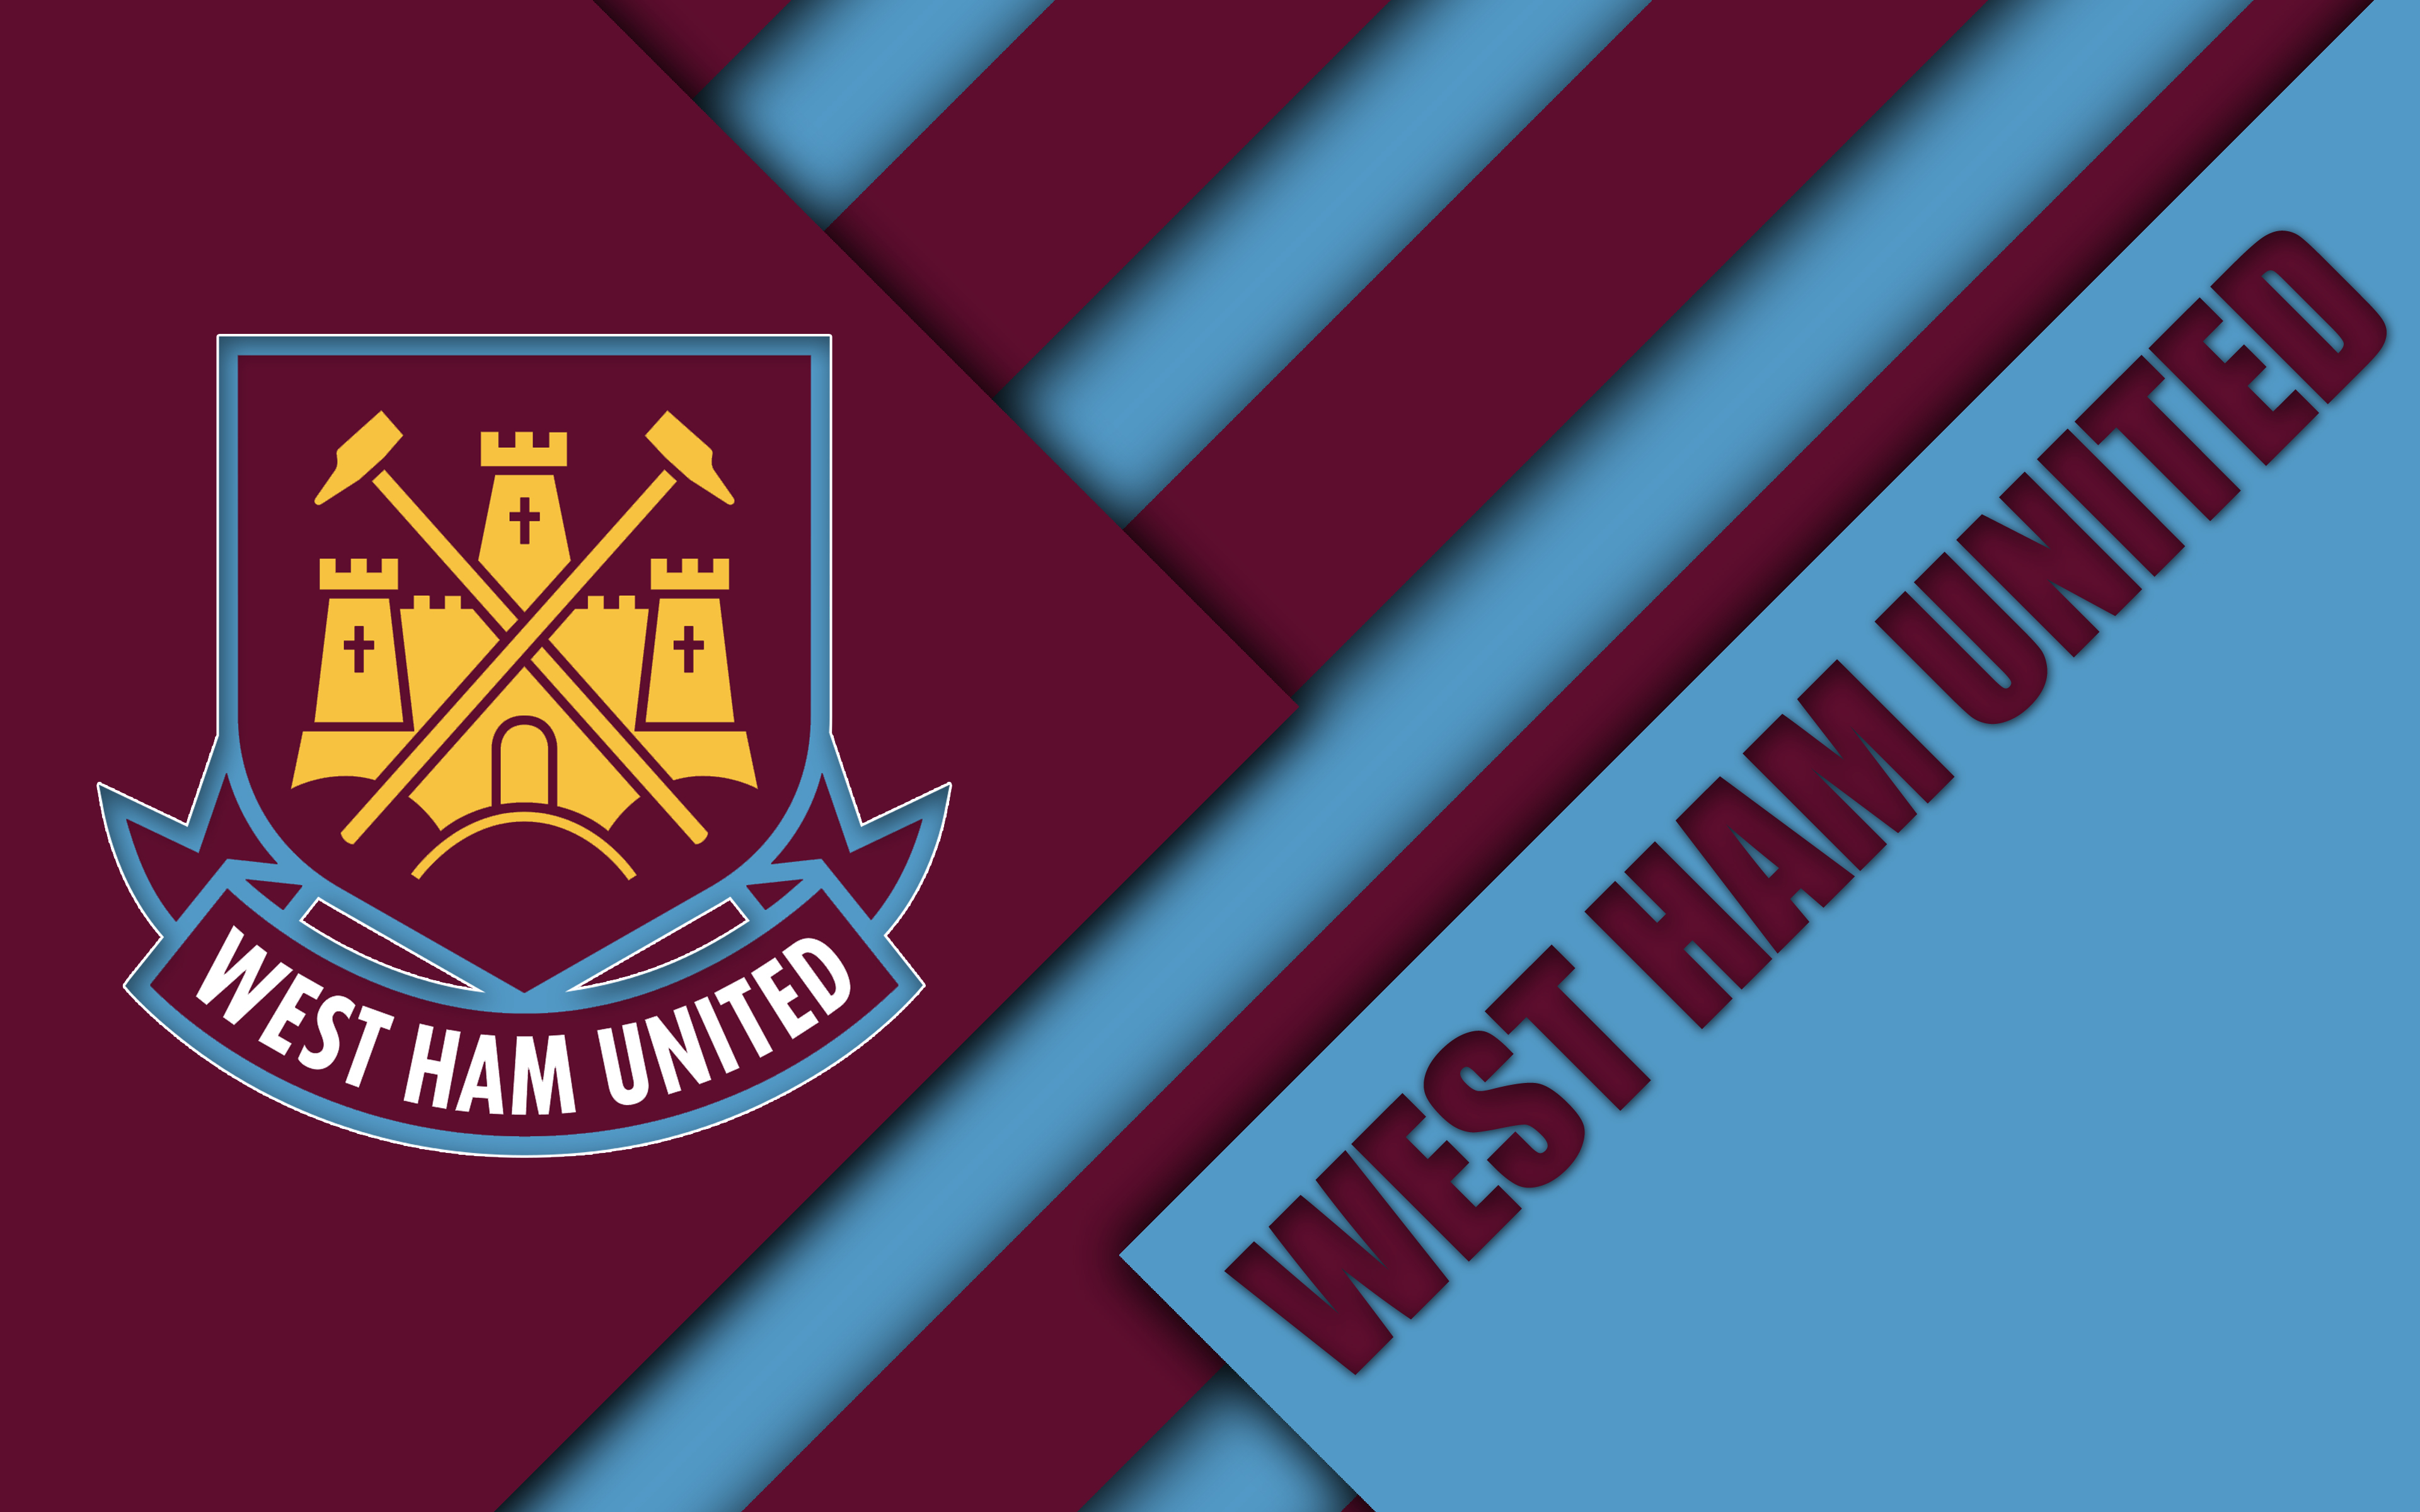 West Ham United FC 4k Ultra HD Wallpaper Background Image 3840x2400